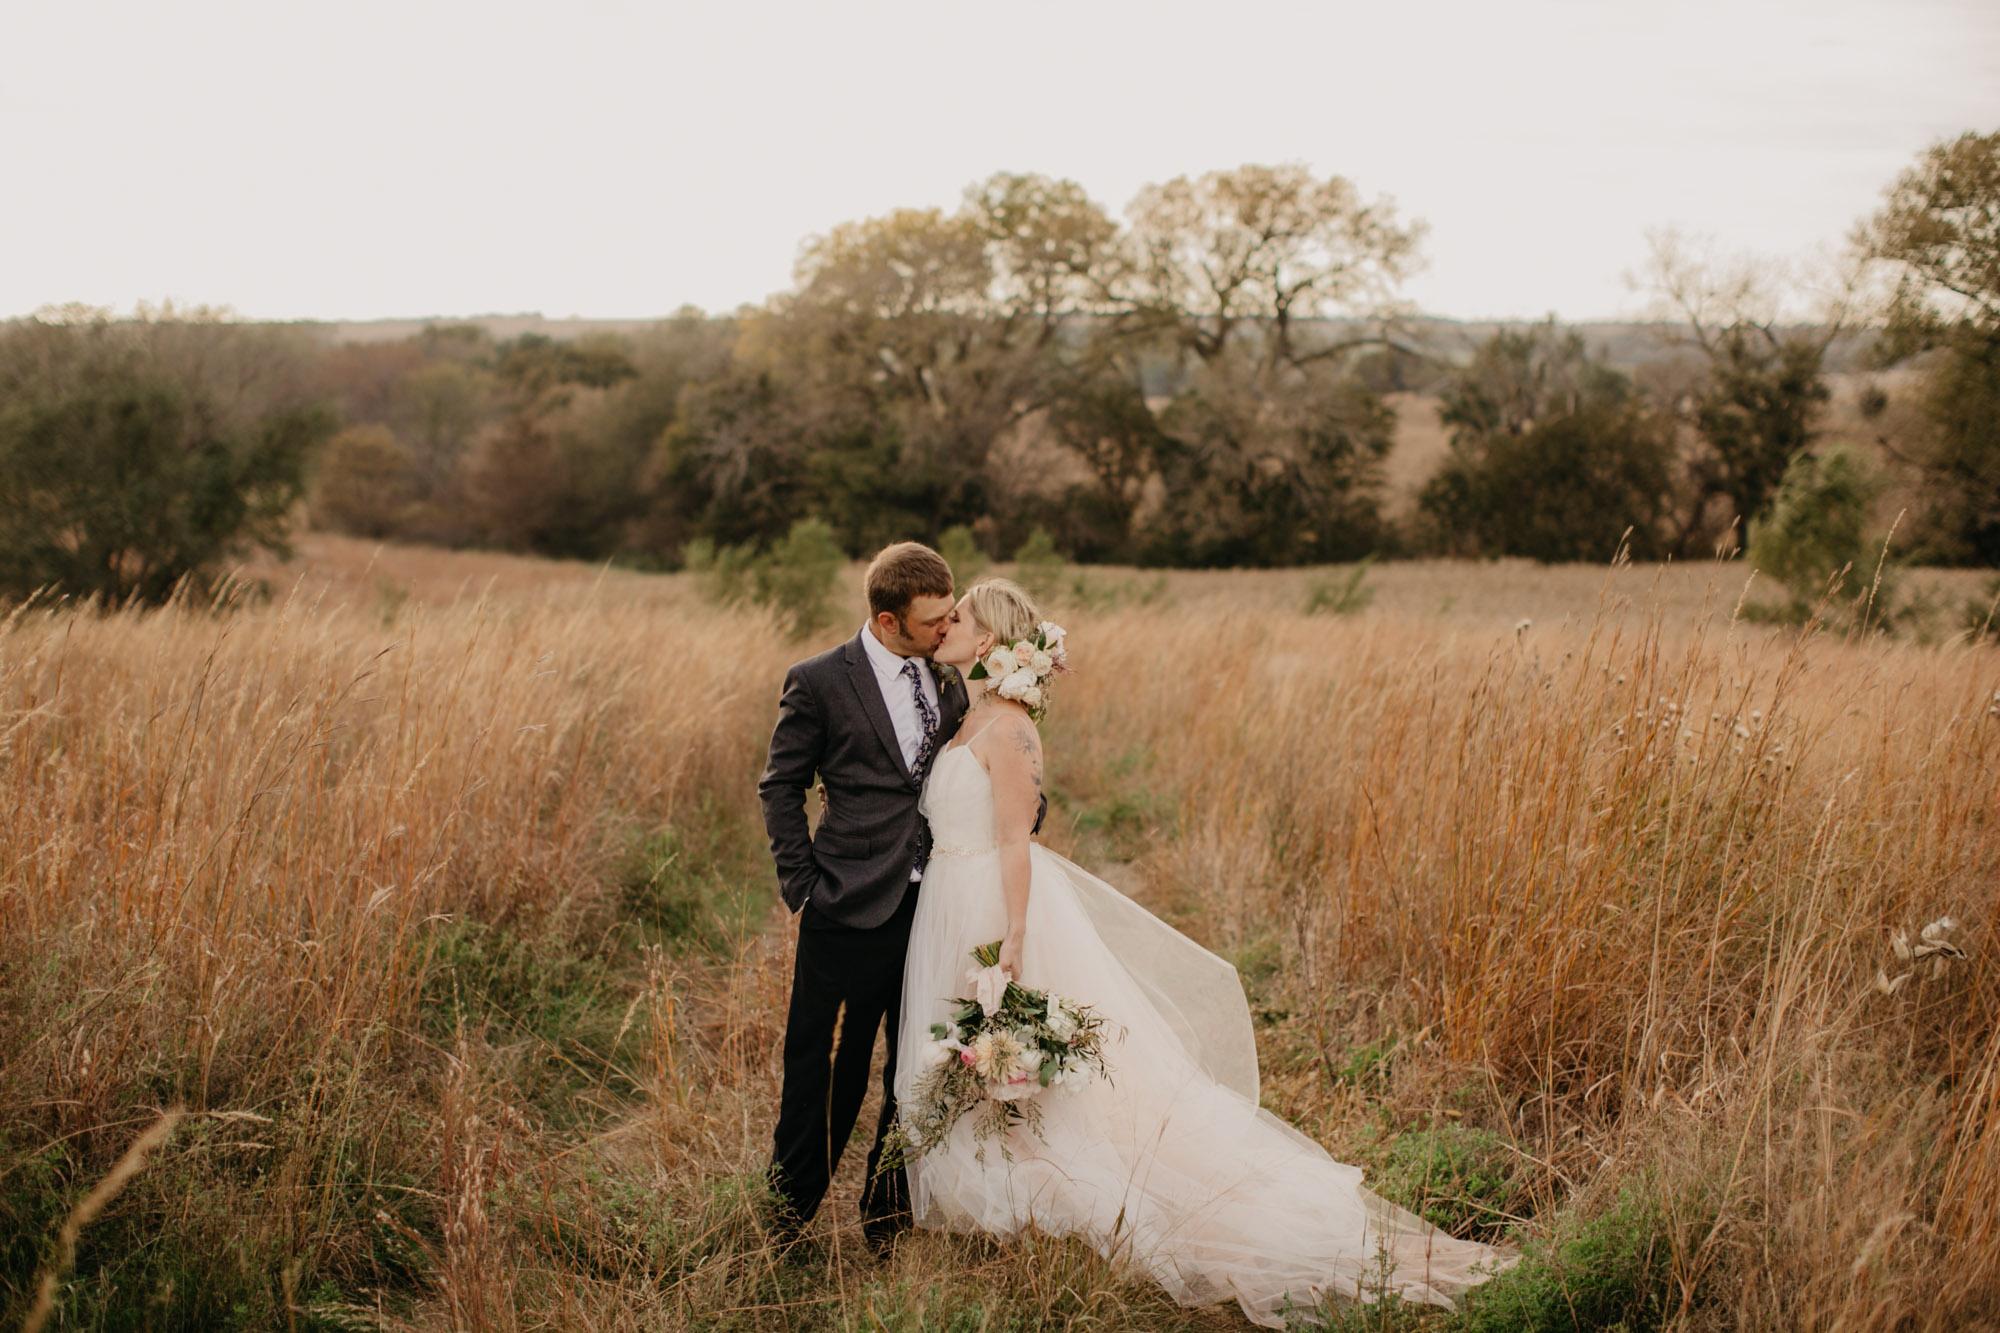 omaha-wedding-photographer-meghan-time-38.jpg